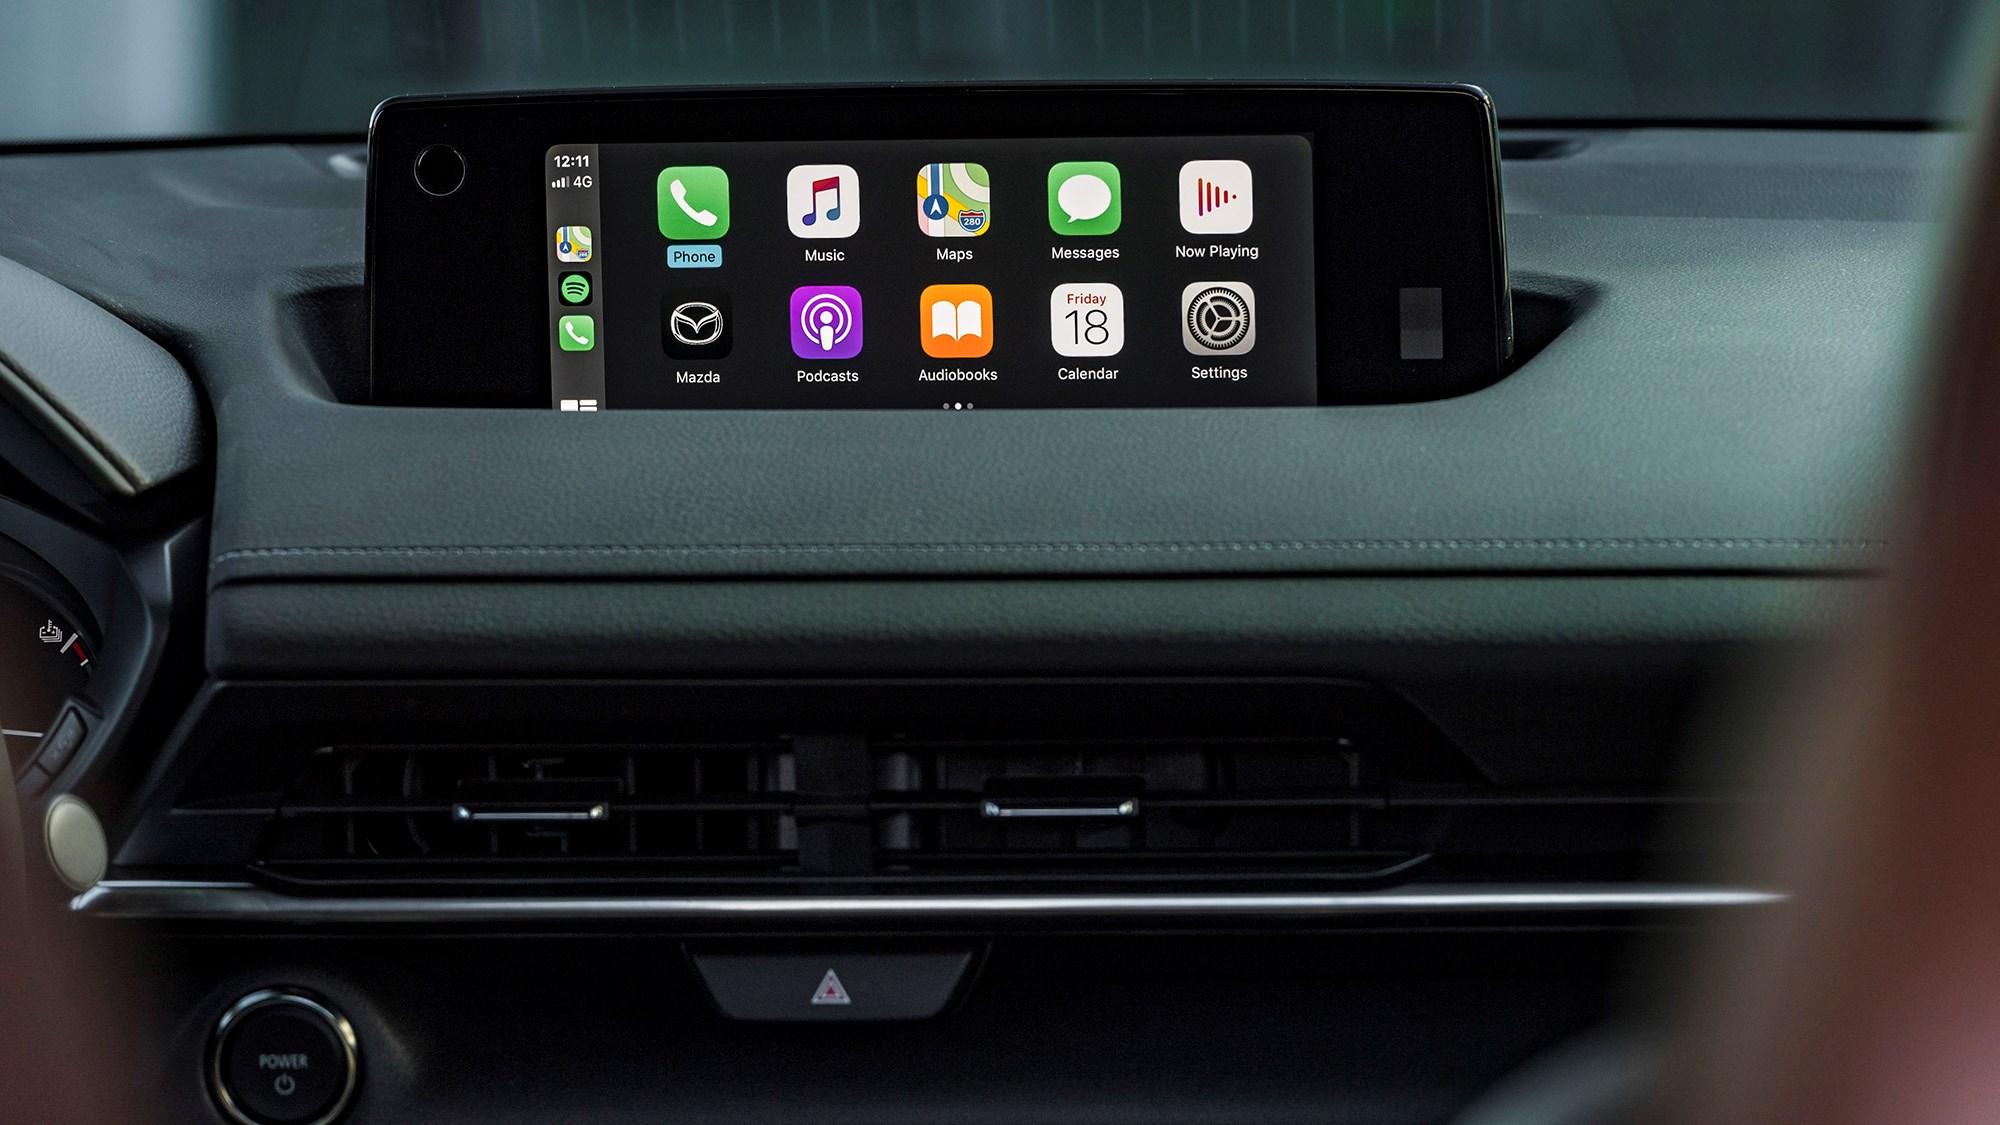 Apple CarPlay is now standard